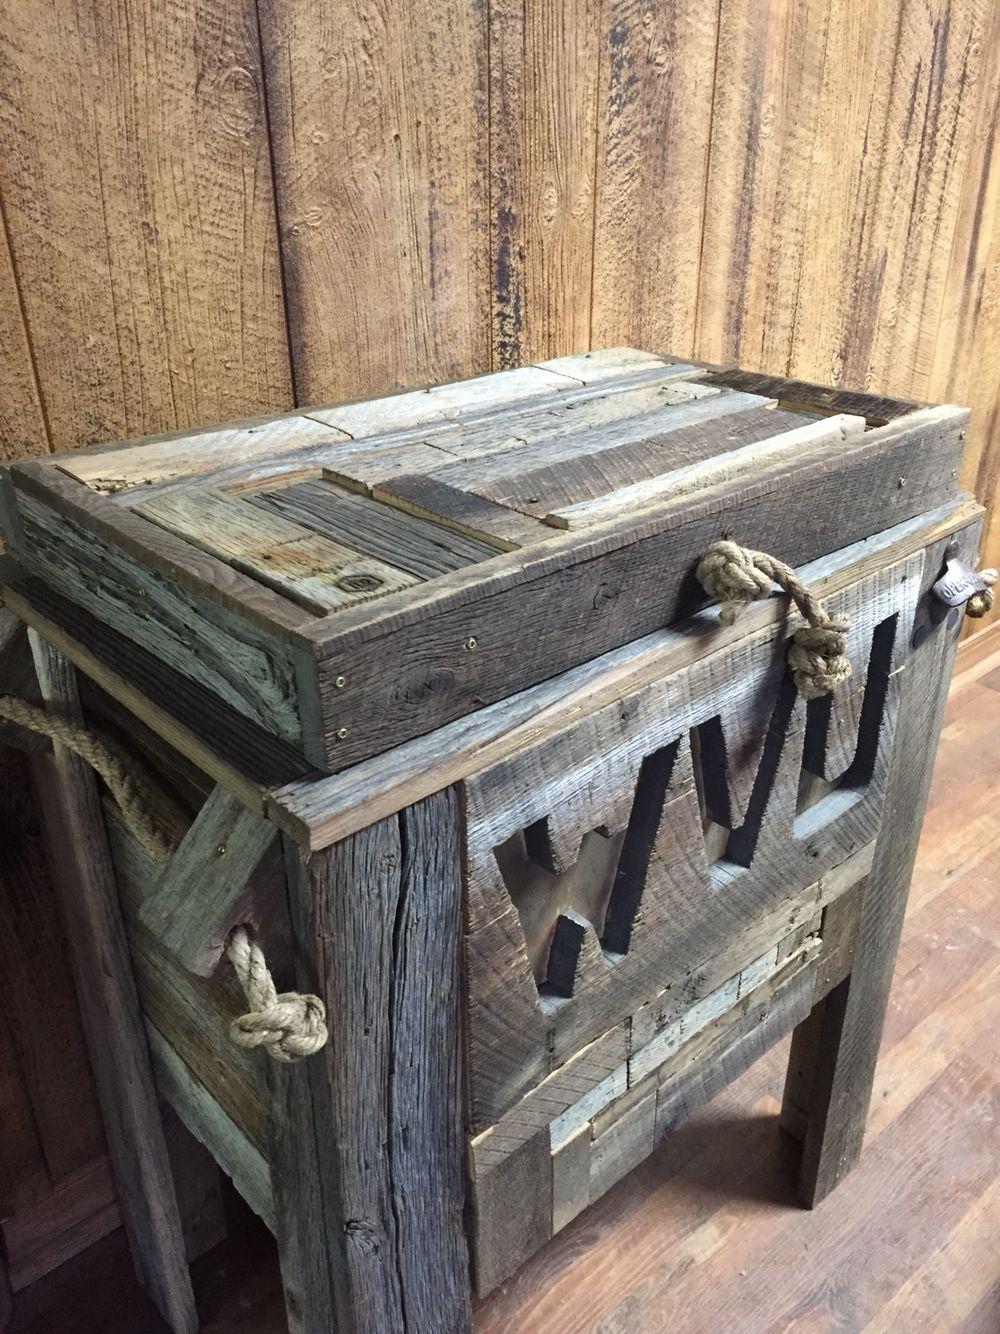 WVU Patio Barn Wood Cooler.